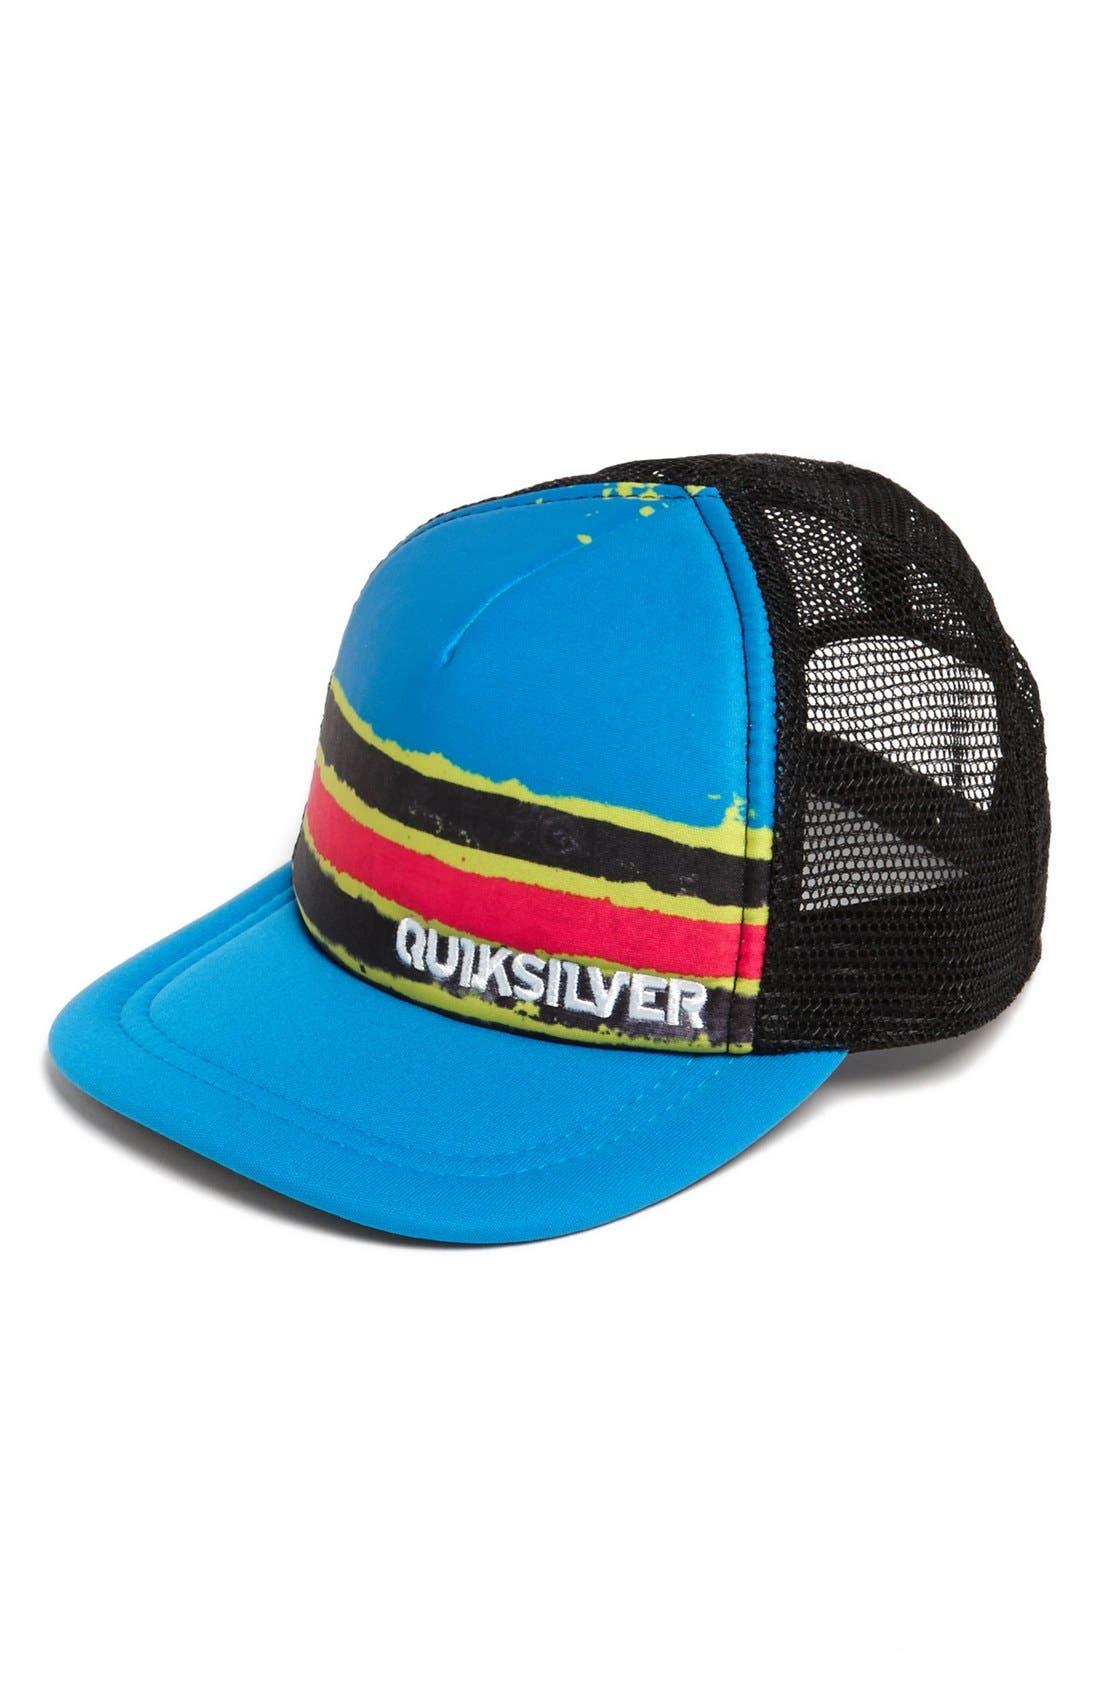 Alternate Image 1 Selected - Quiksilver 'Boards' Trucker Hat (Toddler Boys)